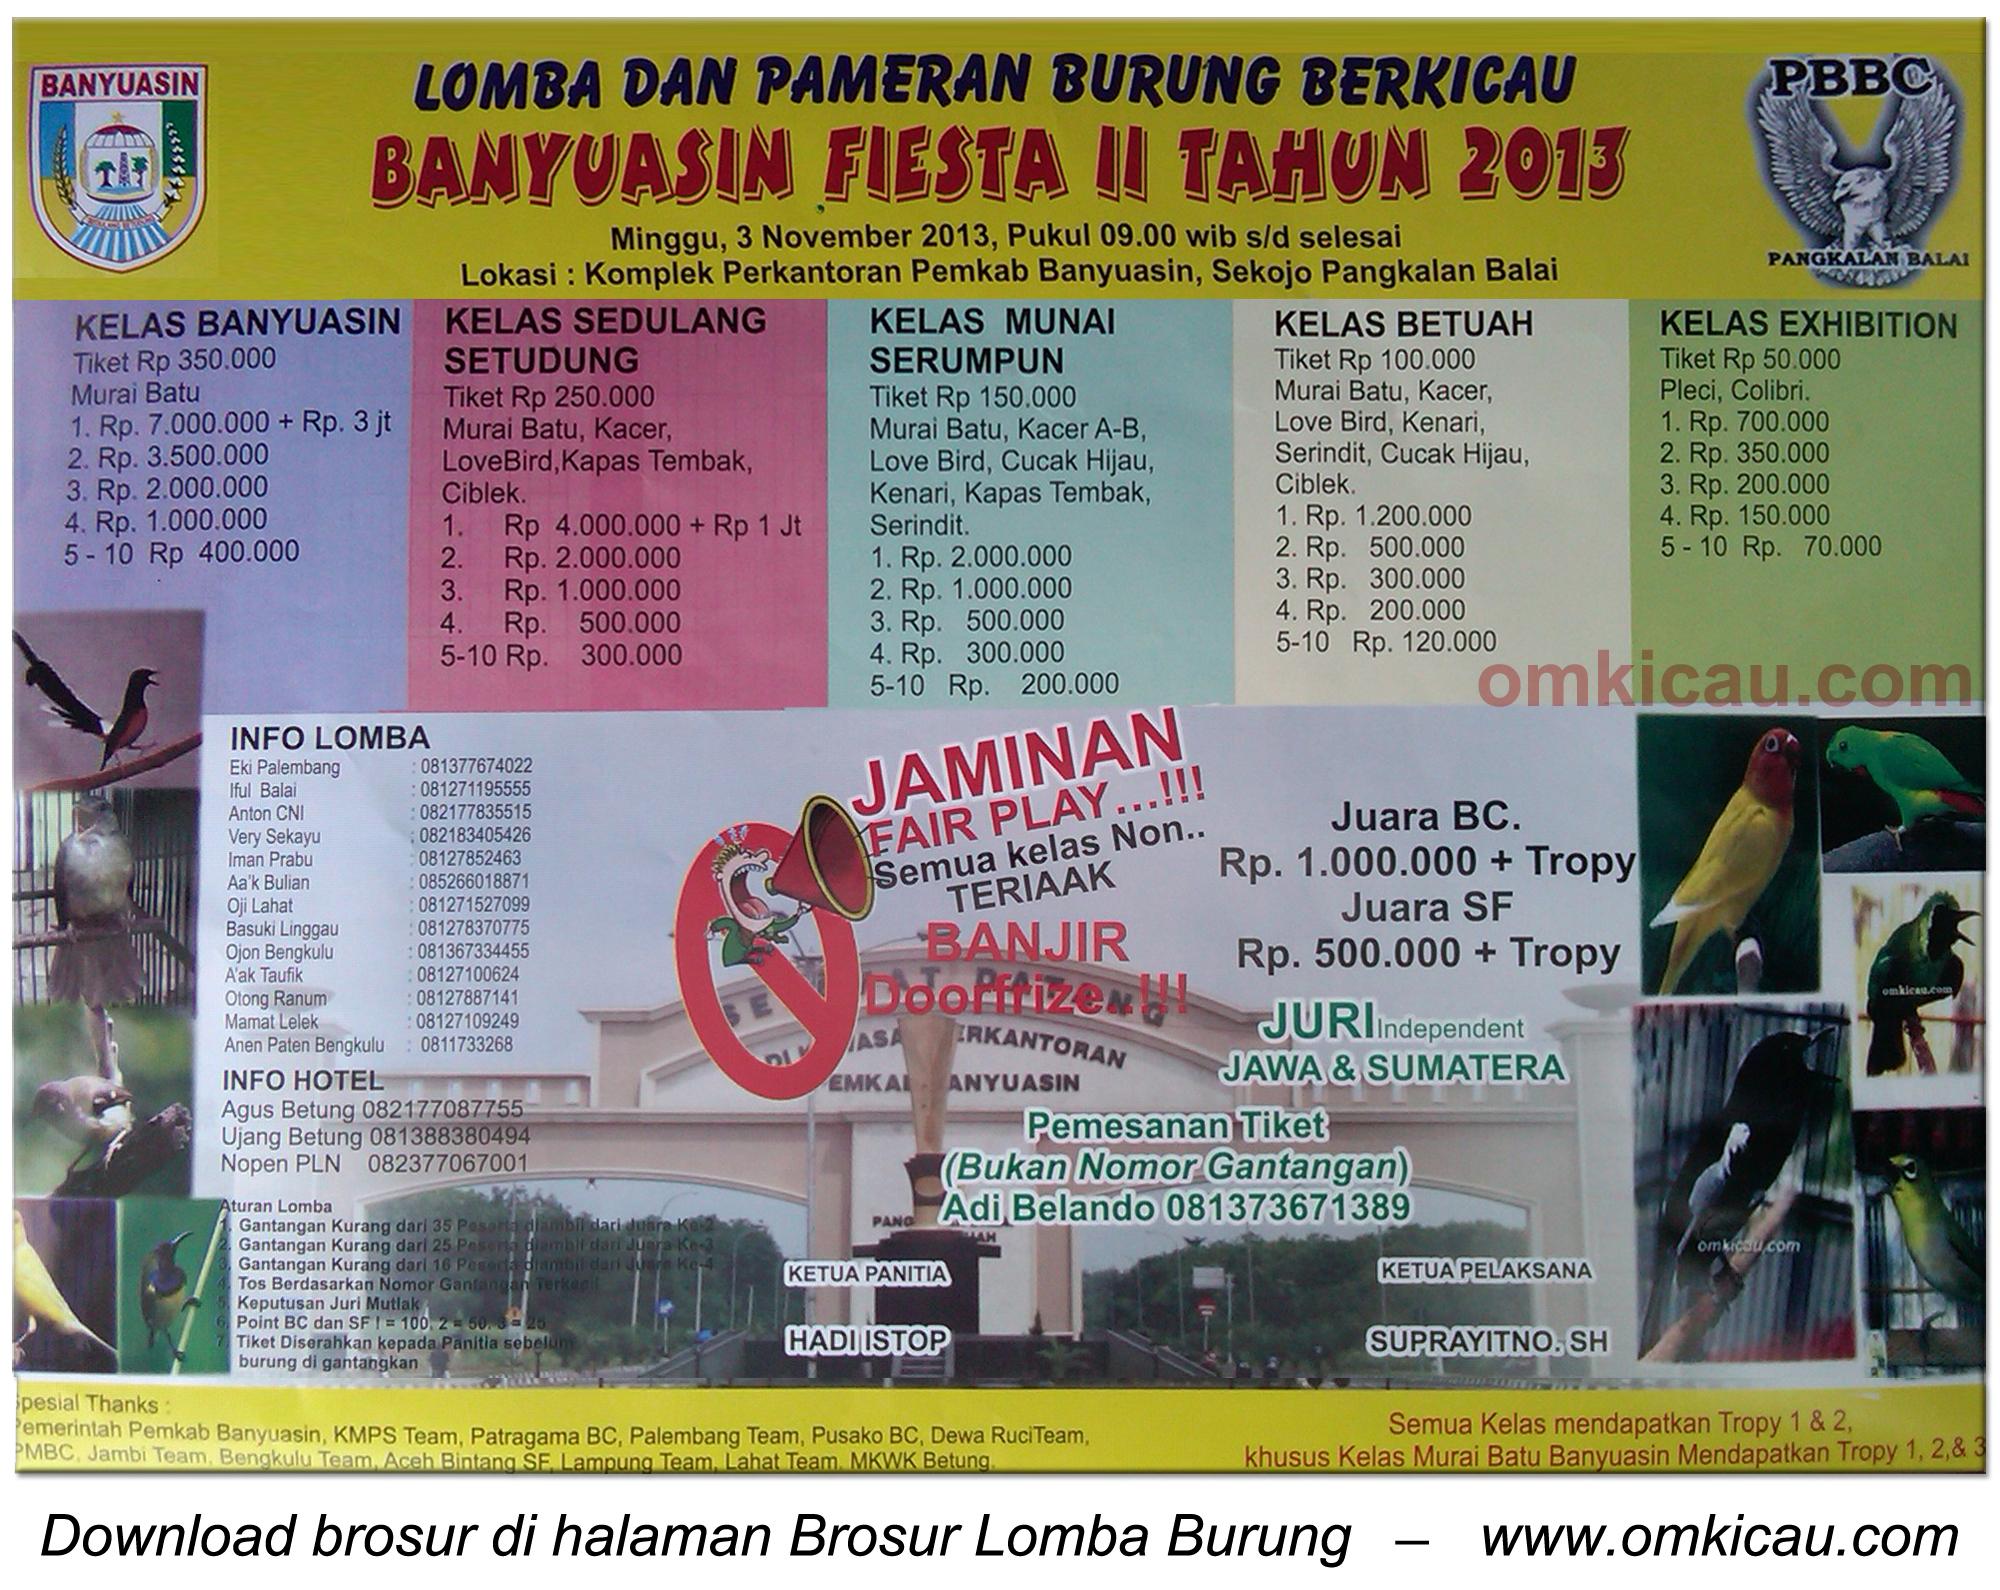 Brosur Lomba Burung Banyuasin Fiesta II, Pangkalan Balai, 3 November 2013